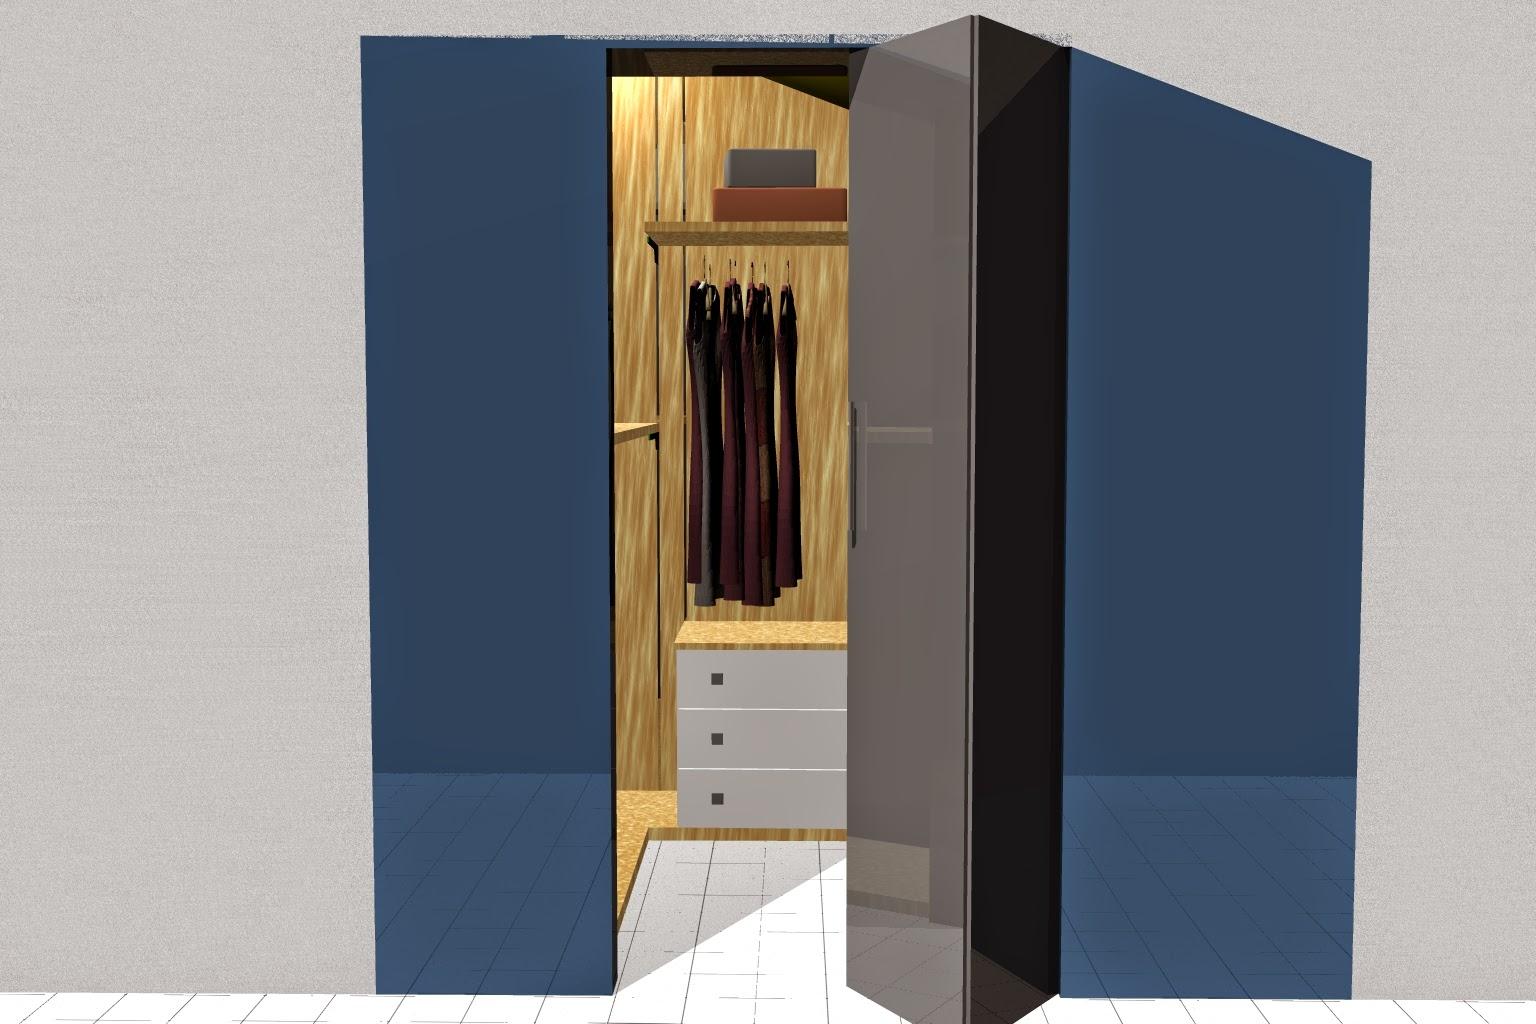 Arredamentincasa cabina armadio per mansarda come arredare for Arredare cabina armadio